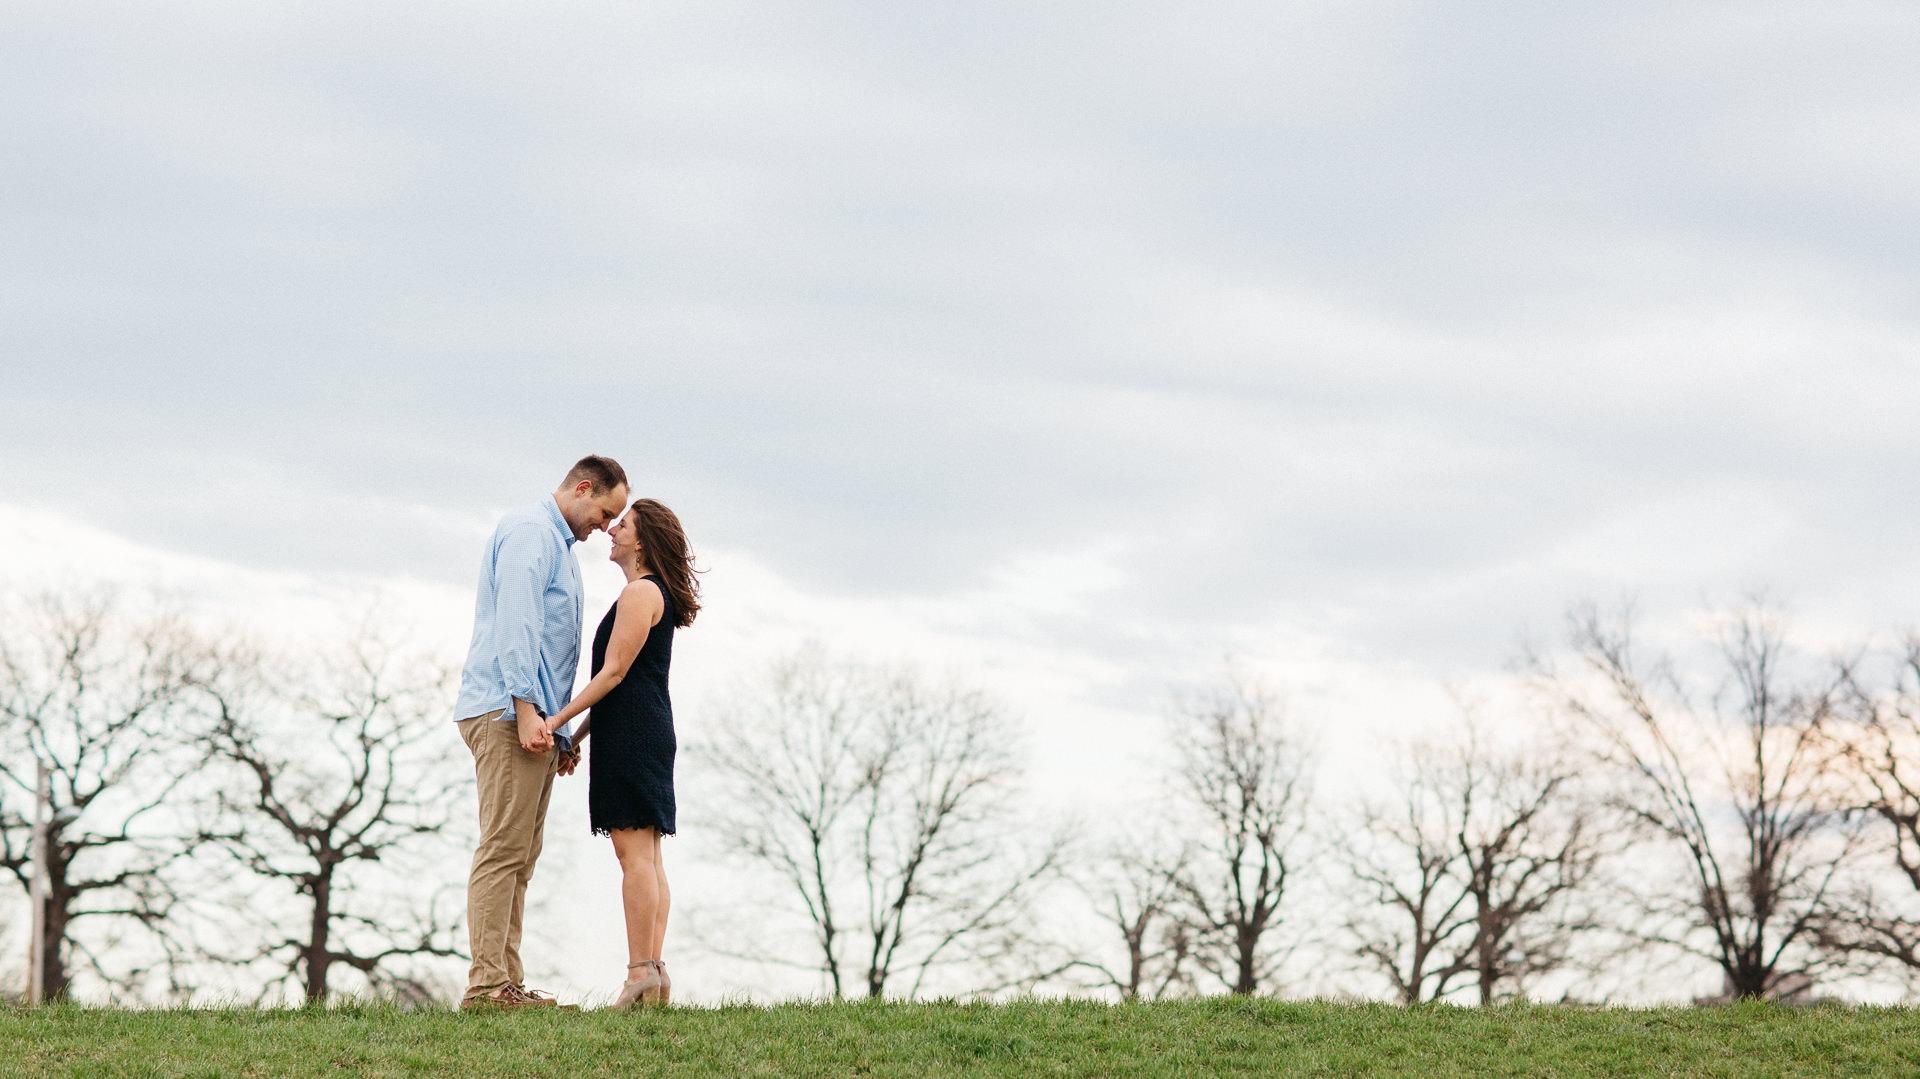 Rocky RIver Ohio Engagement and Wedding Photographer 16.jpg